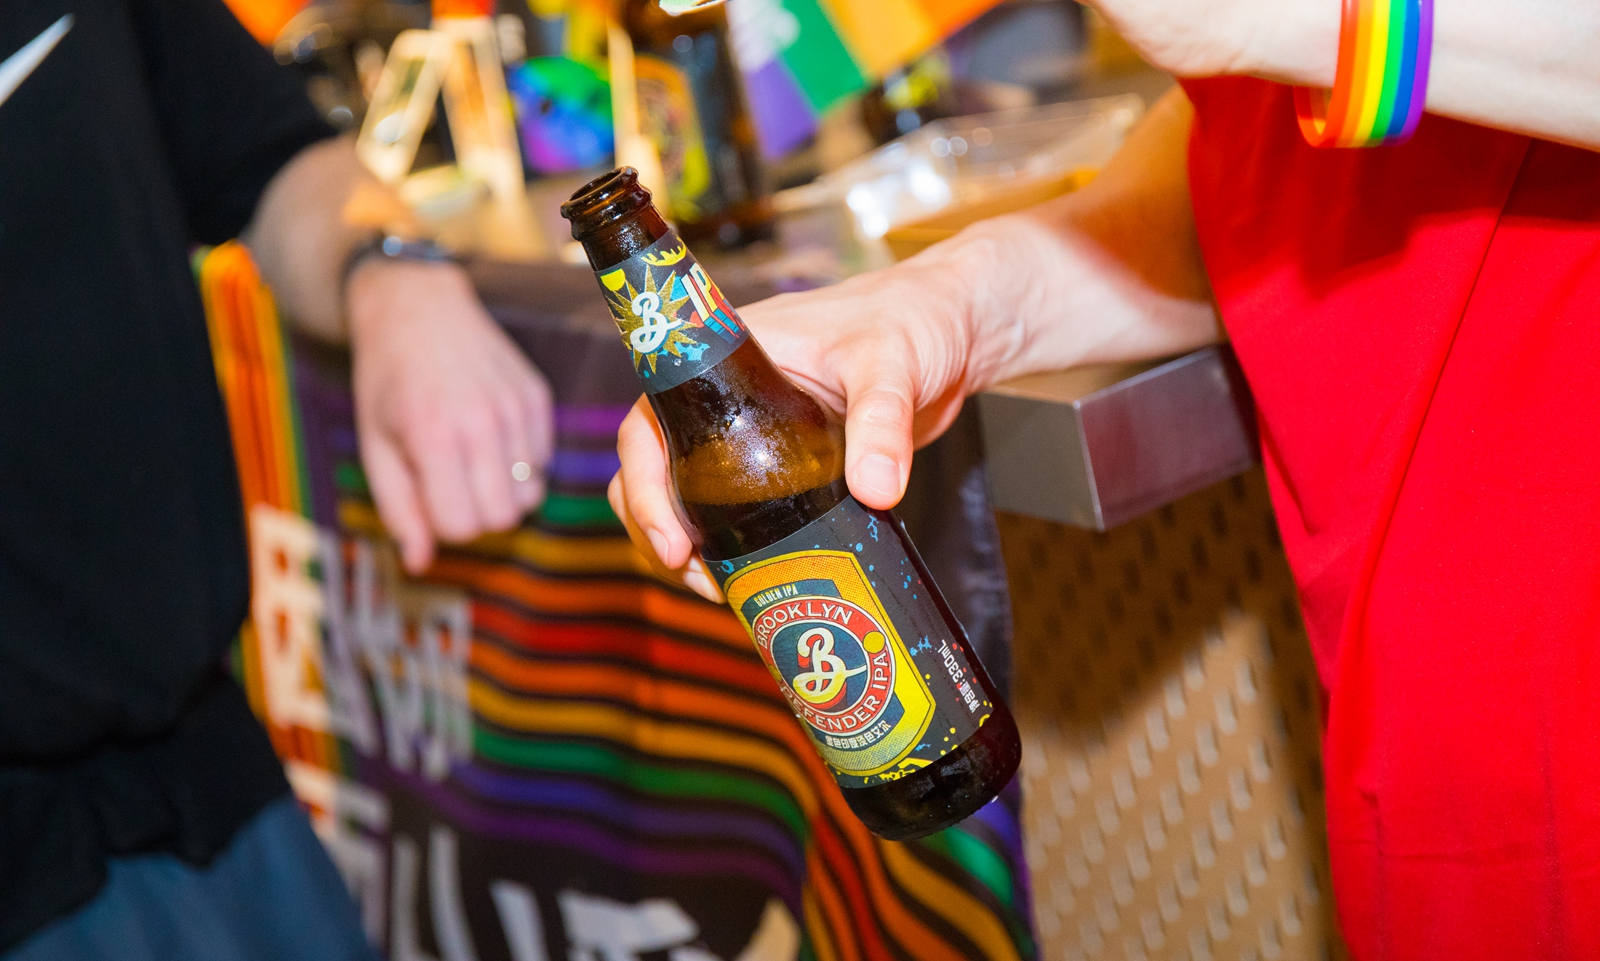 Brooklyn Brewery 助力「上海骄傲节」活动回顾